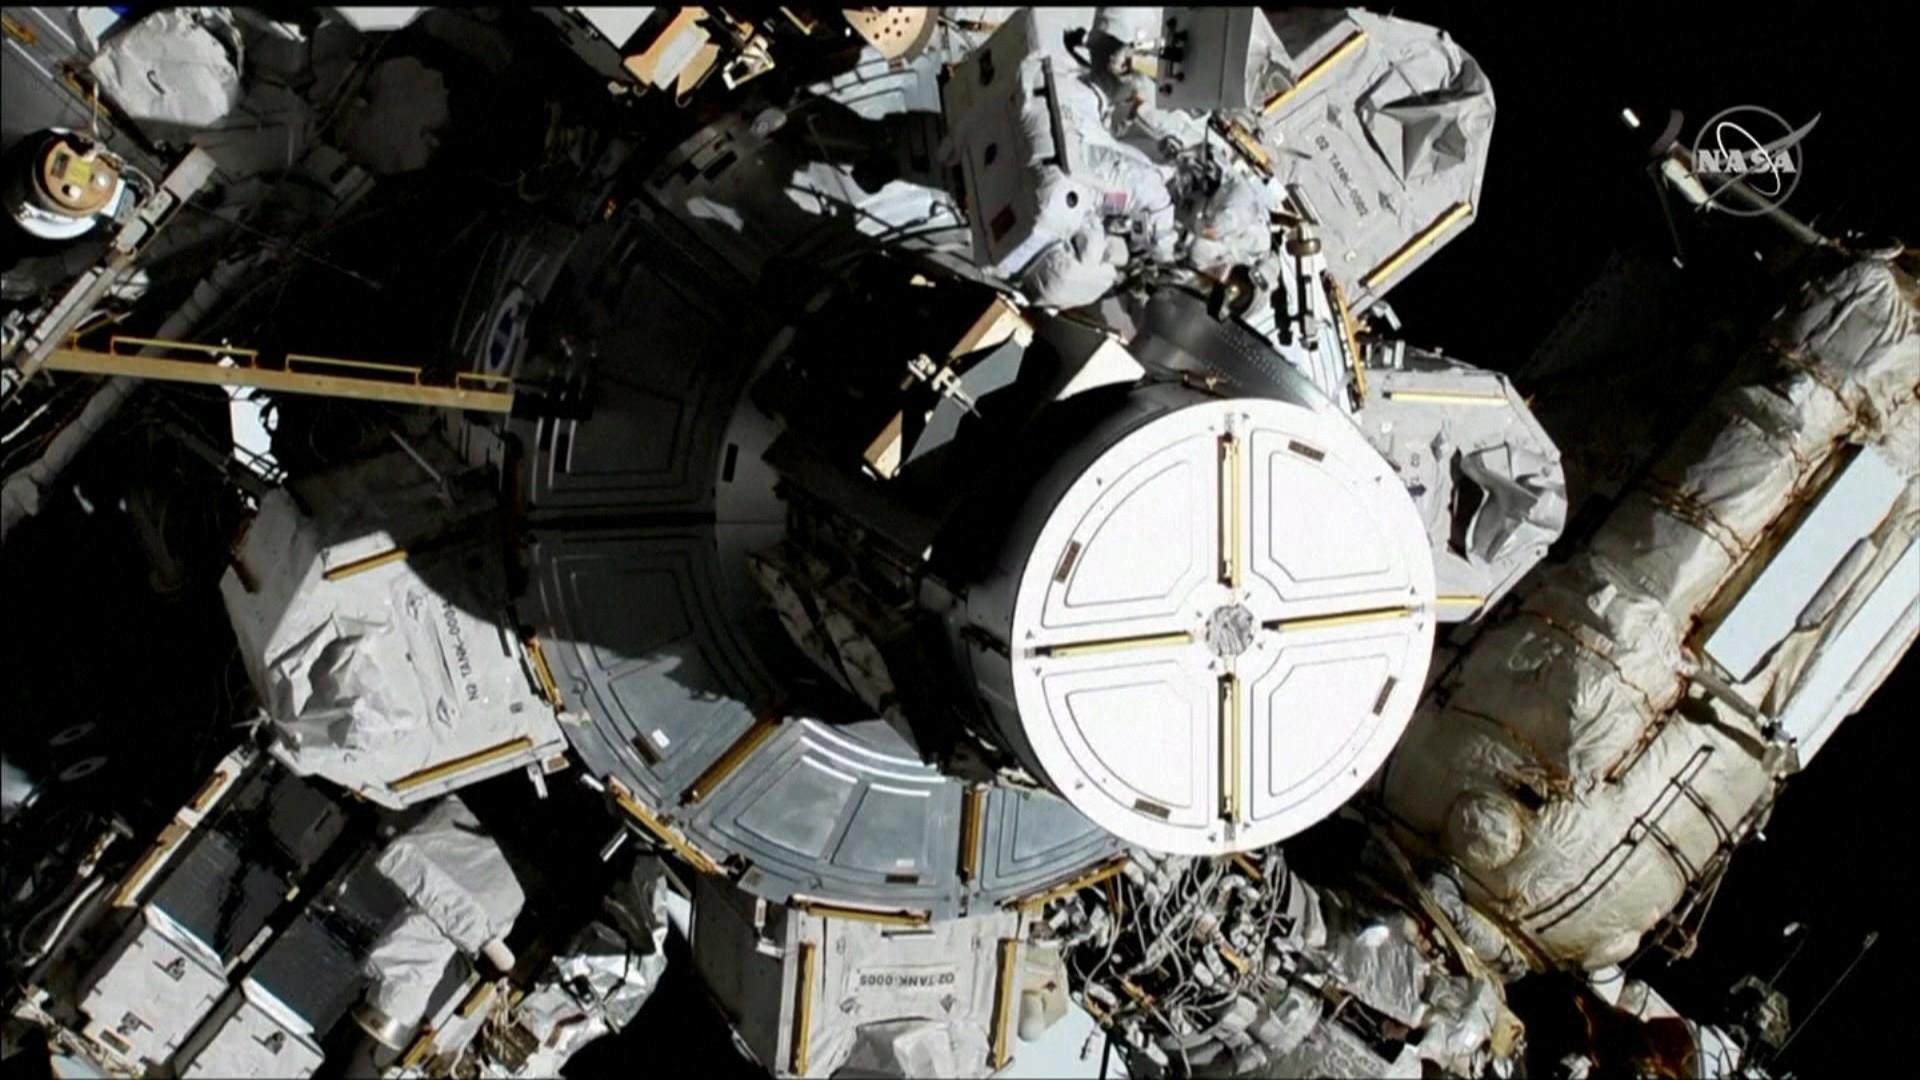 Astronauts Jessica Meir and Christina Koch complete historic spacewalk